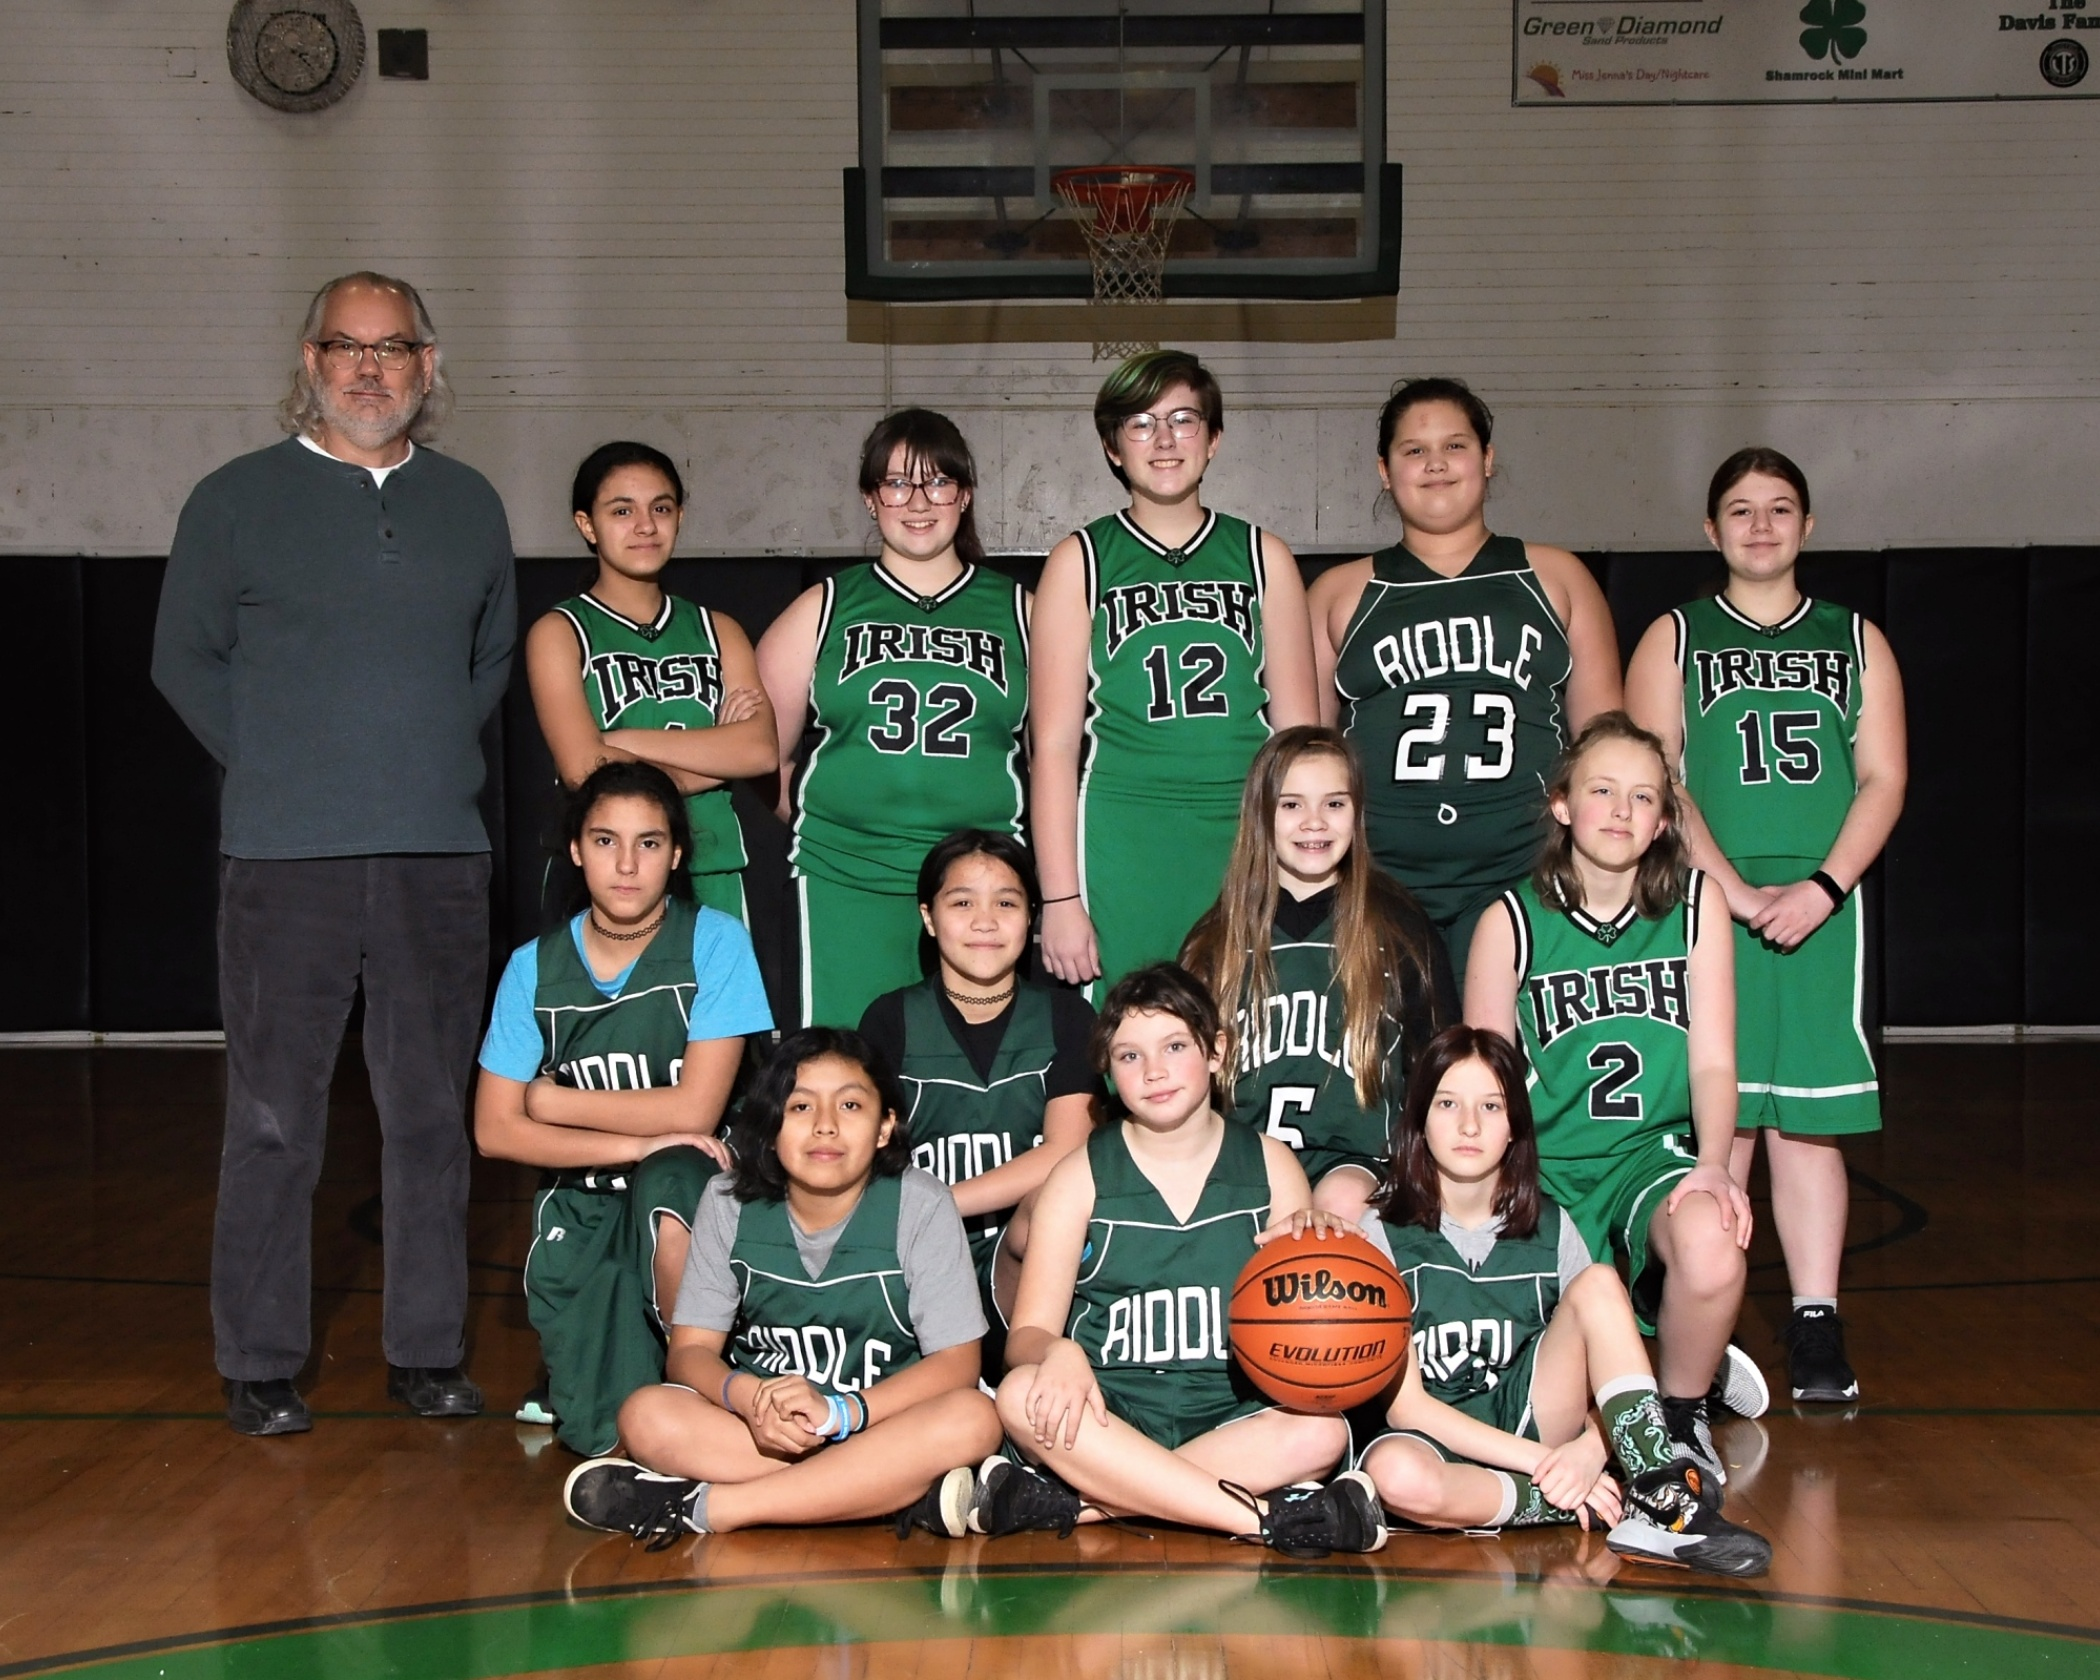 Riddle Junior High School girls basketball team photo.